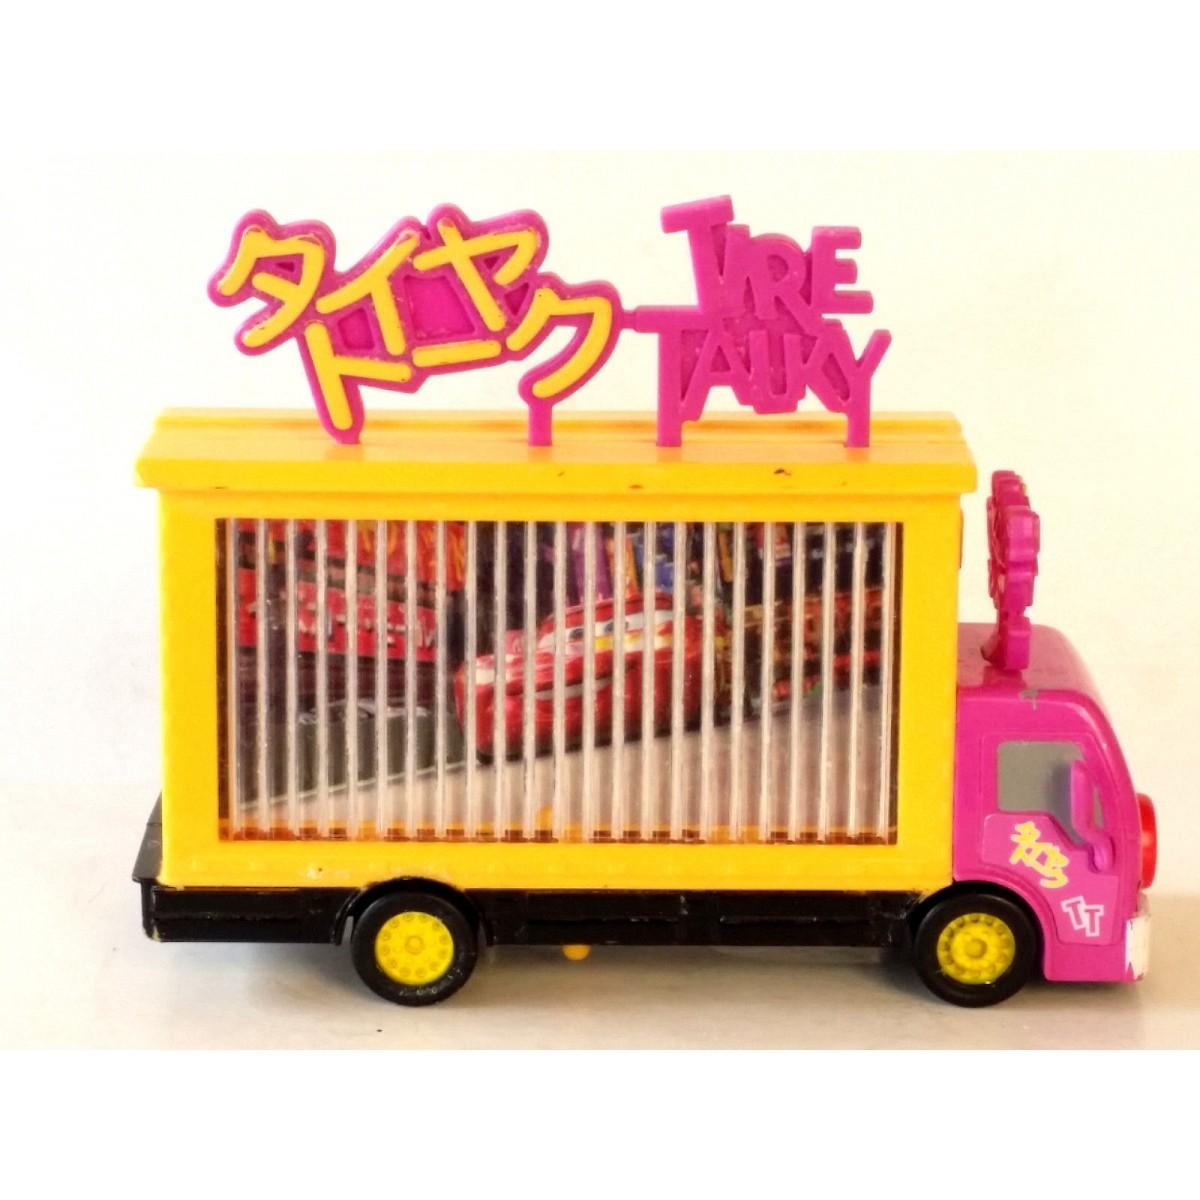 Disney Pixar - Cars - Taia Decoture  - Hobby Lobby CollectorStore